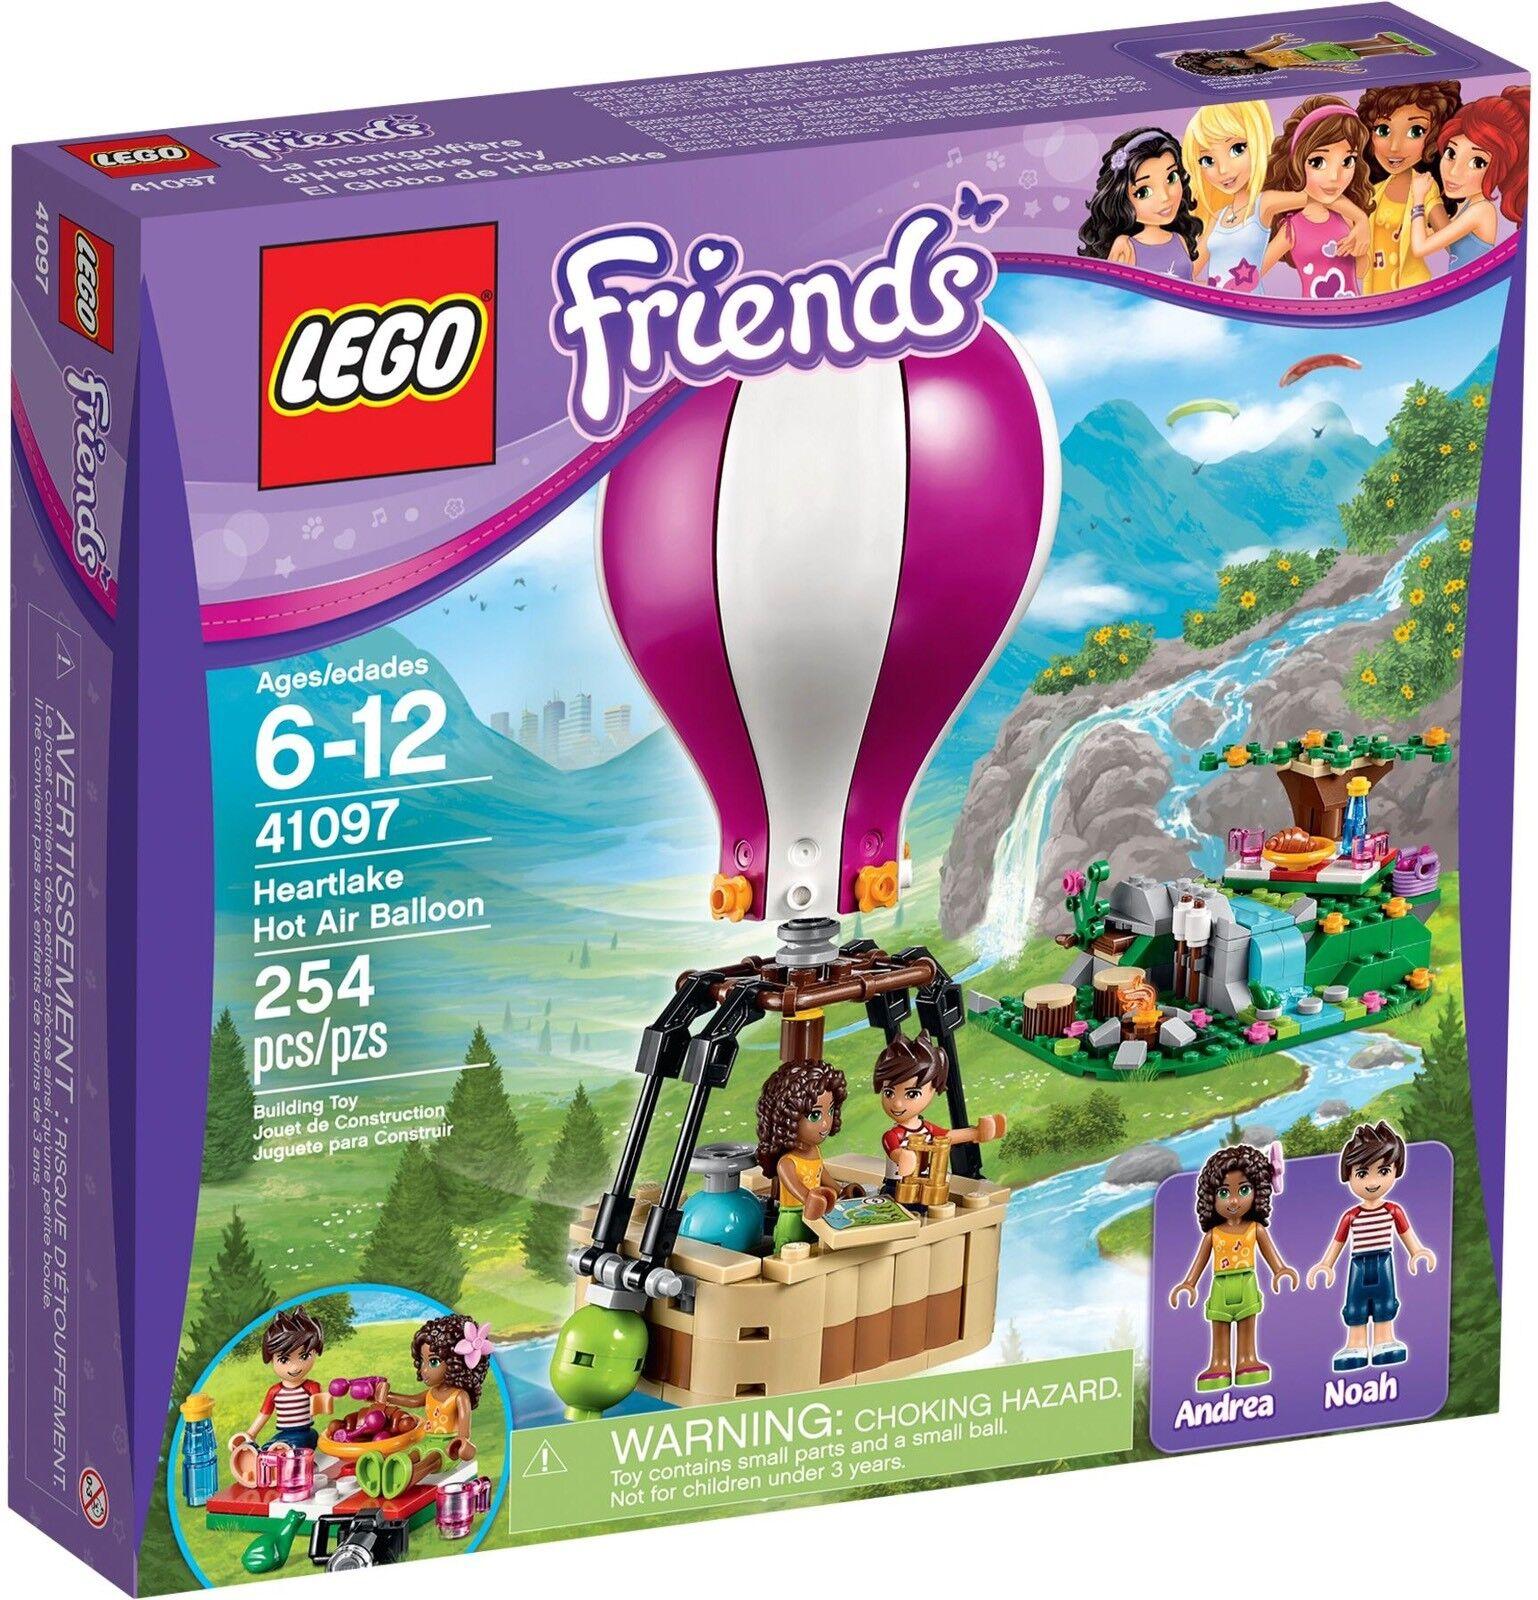 LEGO Friends  41097 - Heartlake Hot Air Balloon - Collector 2015 - NEW   NEUF